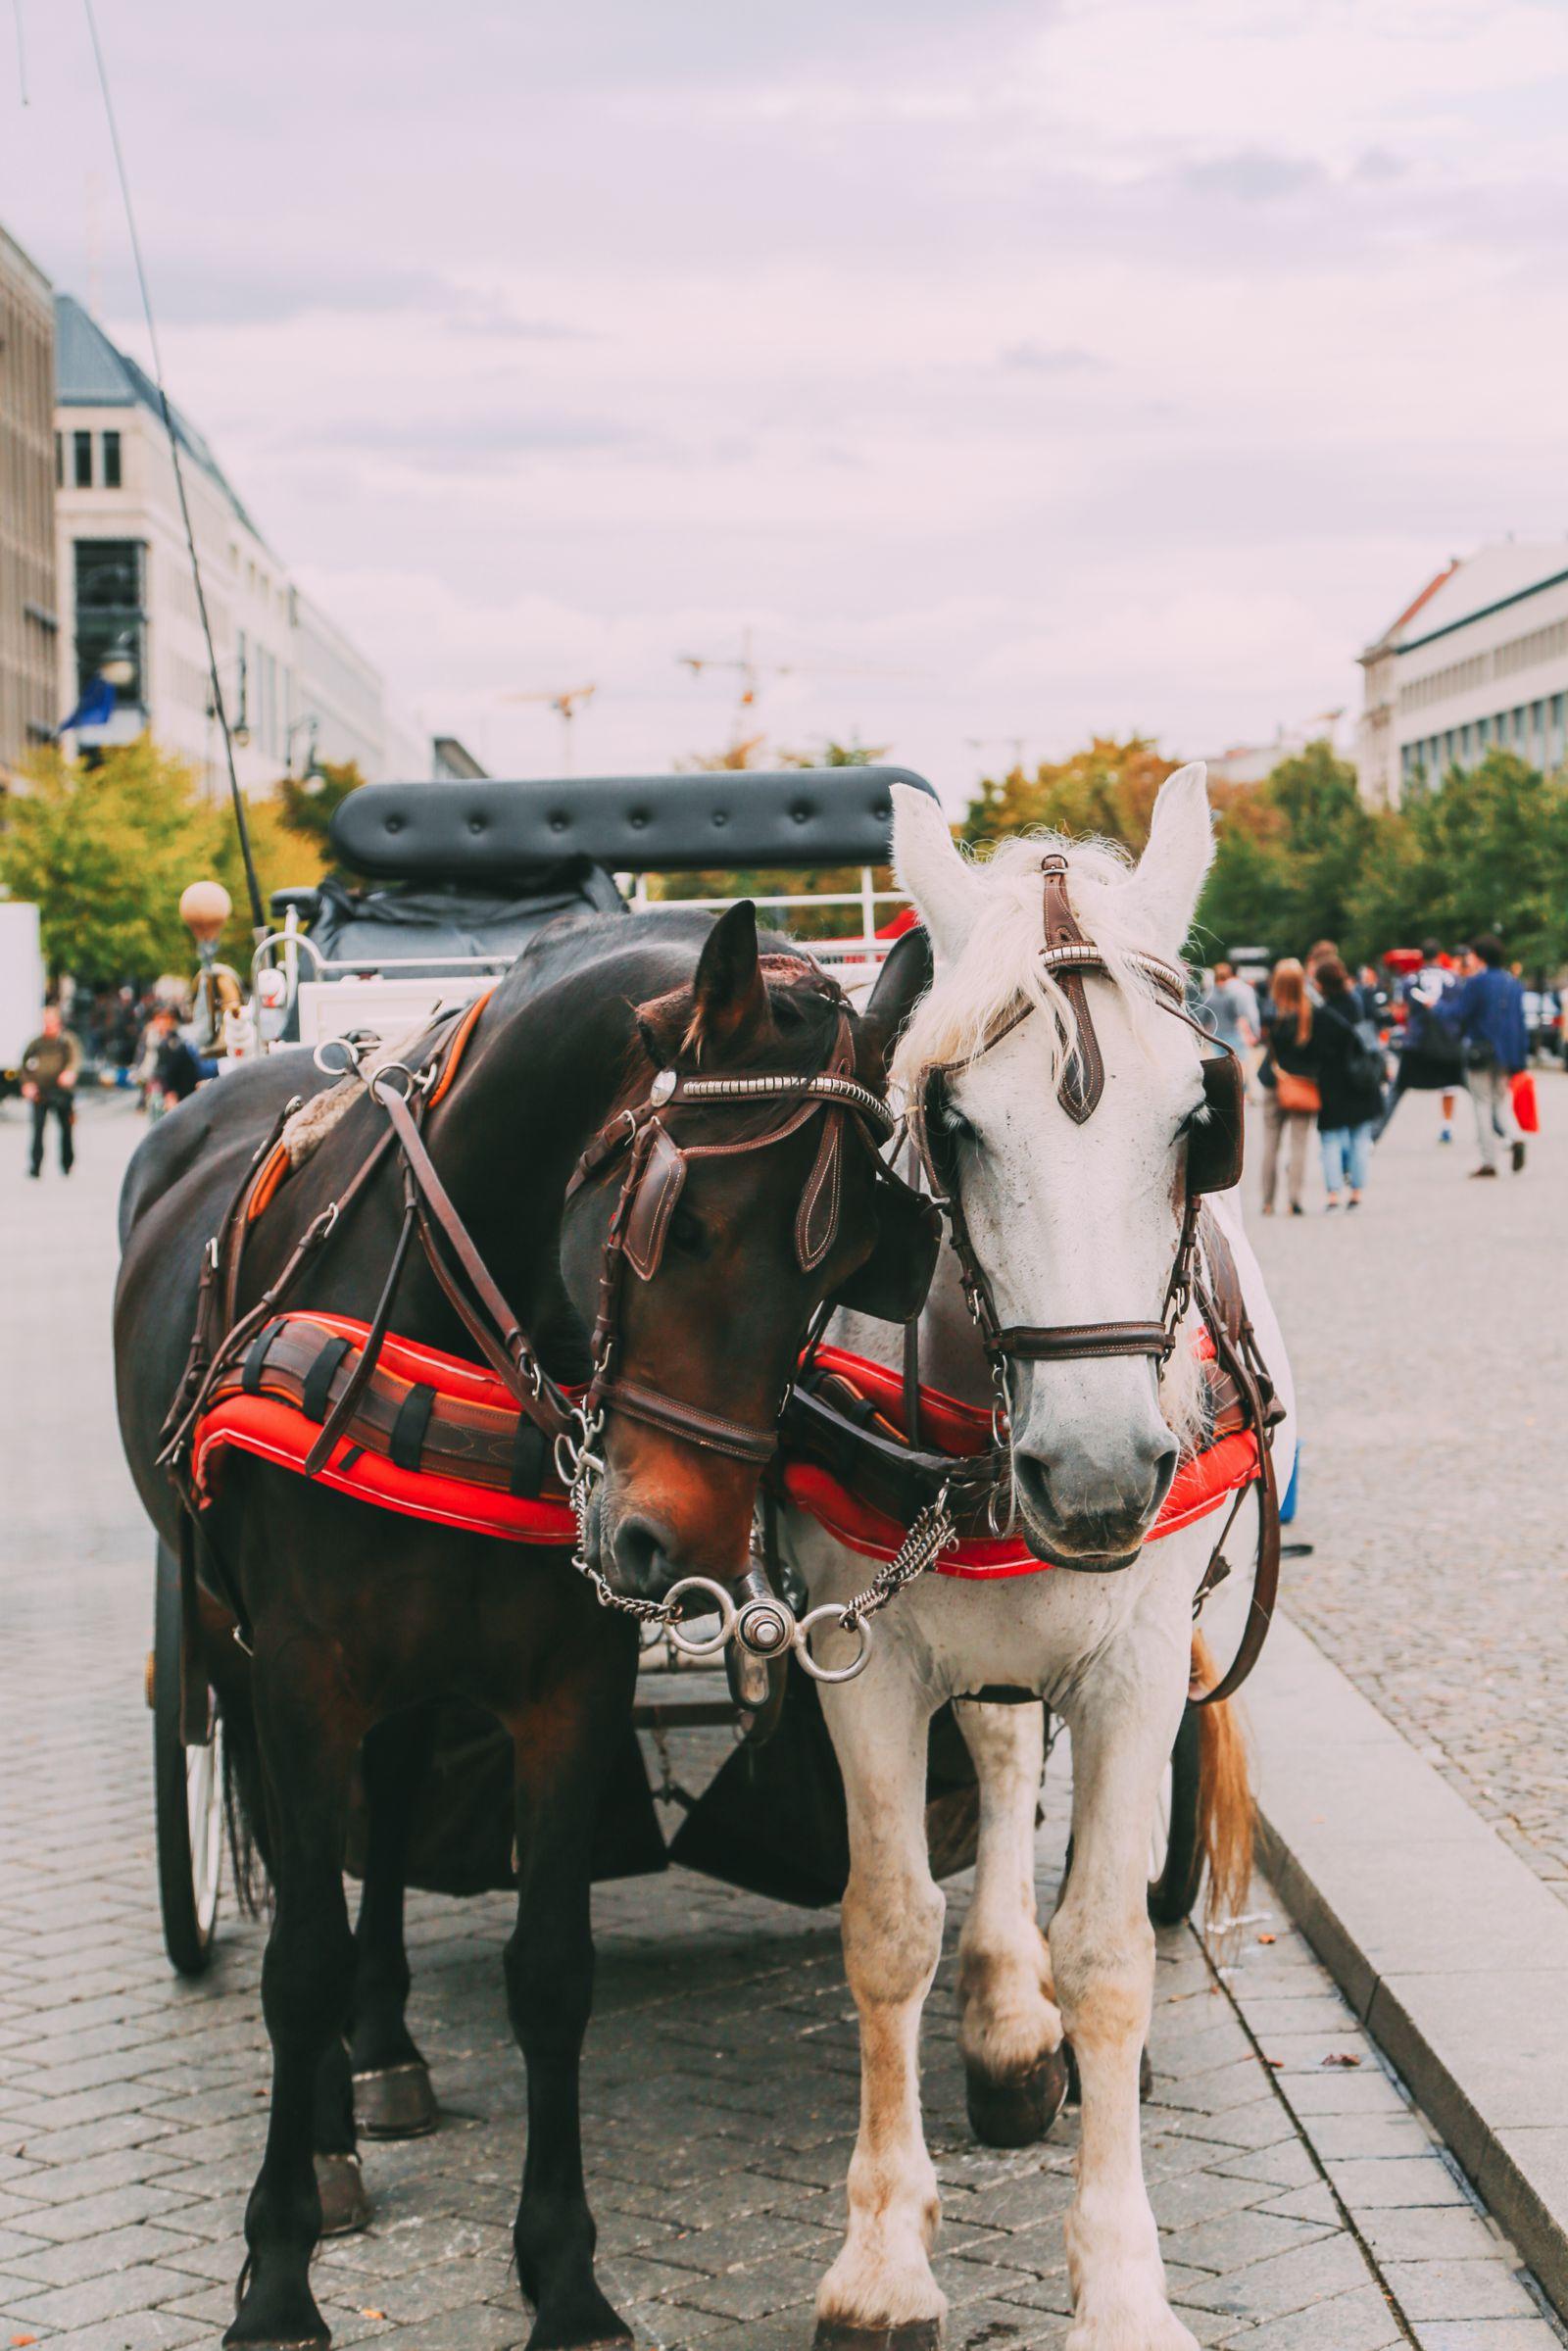 Sightseeing In Berlin, Germany - Part 2 (22)